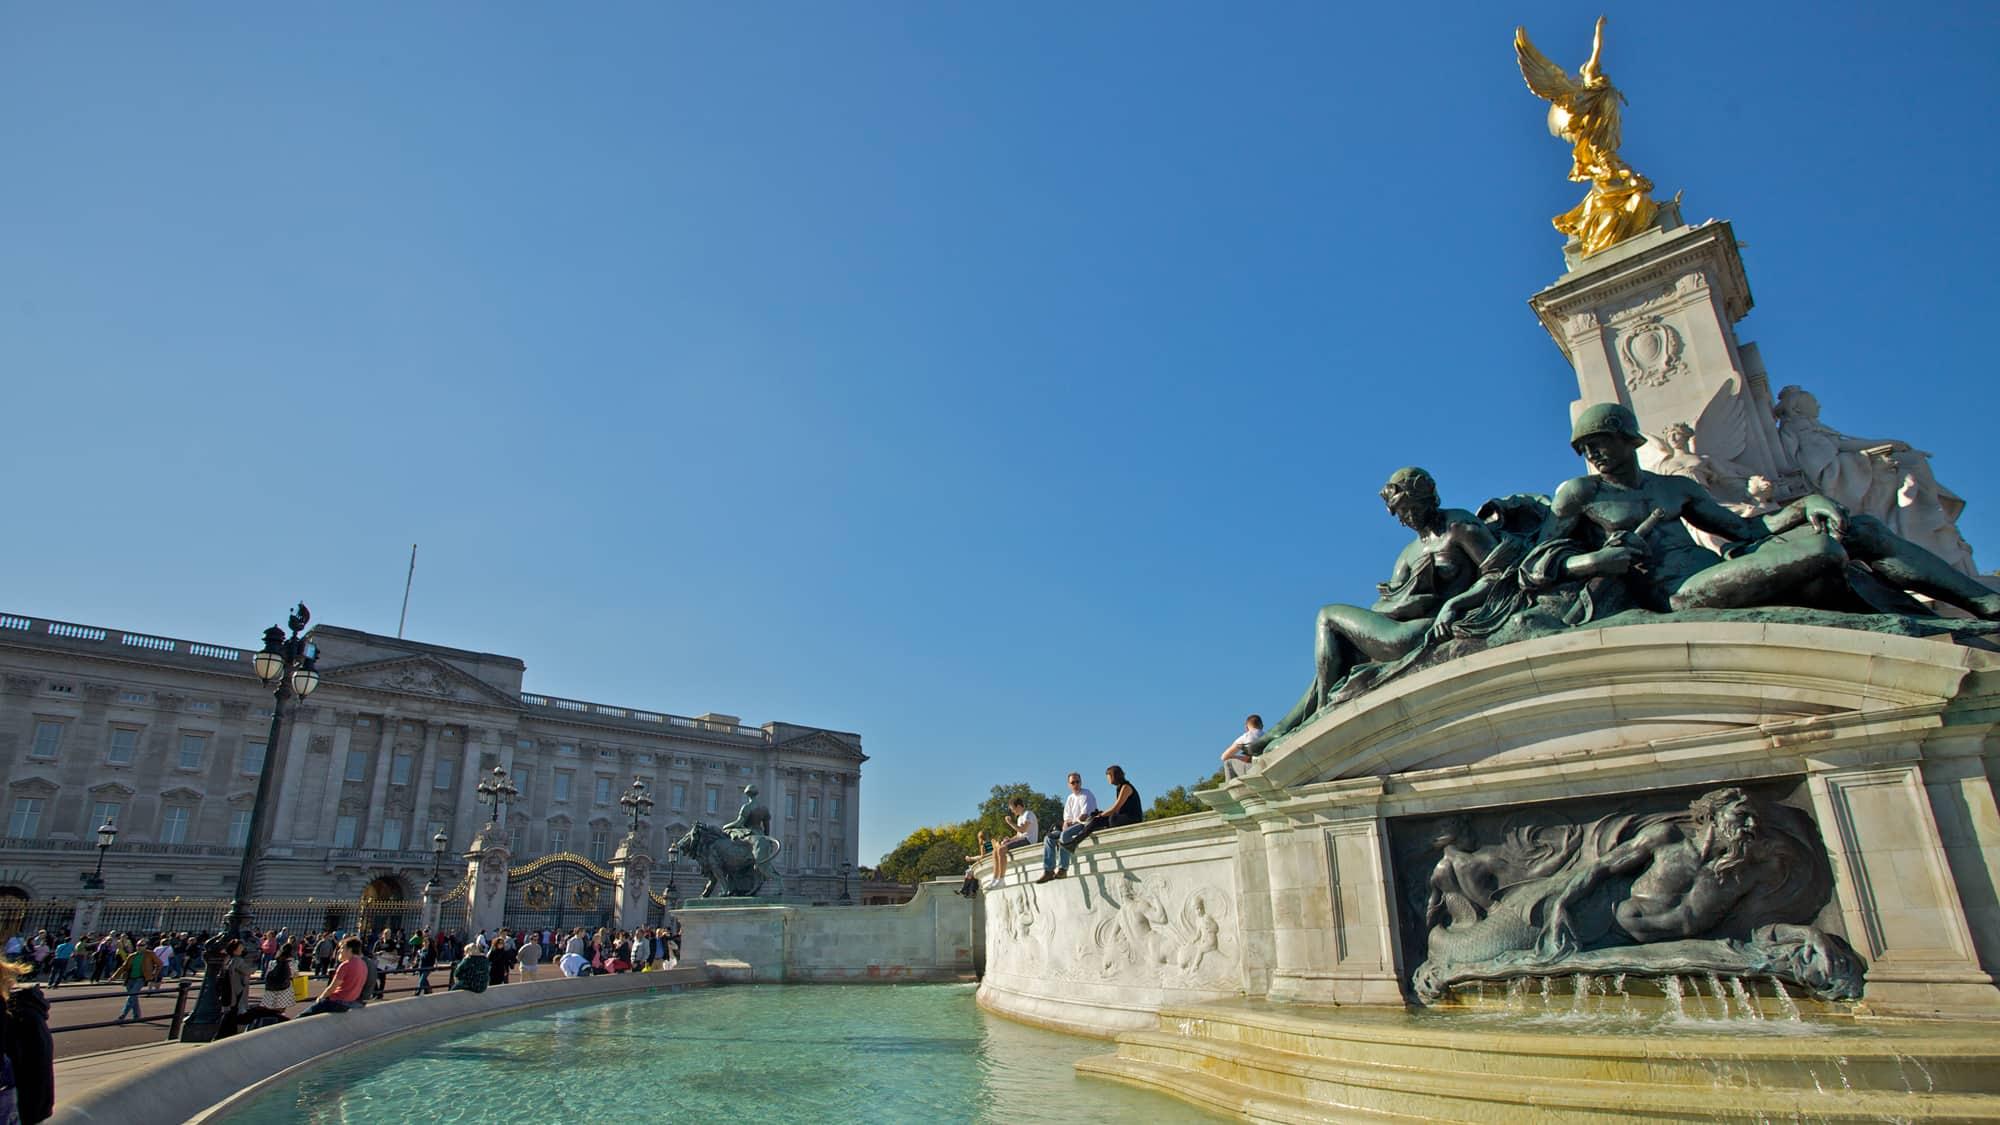 Buckingham Palace fountain in London